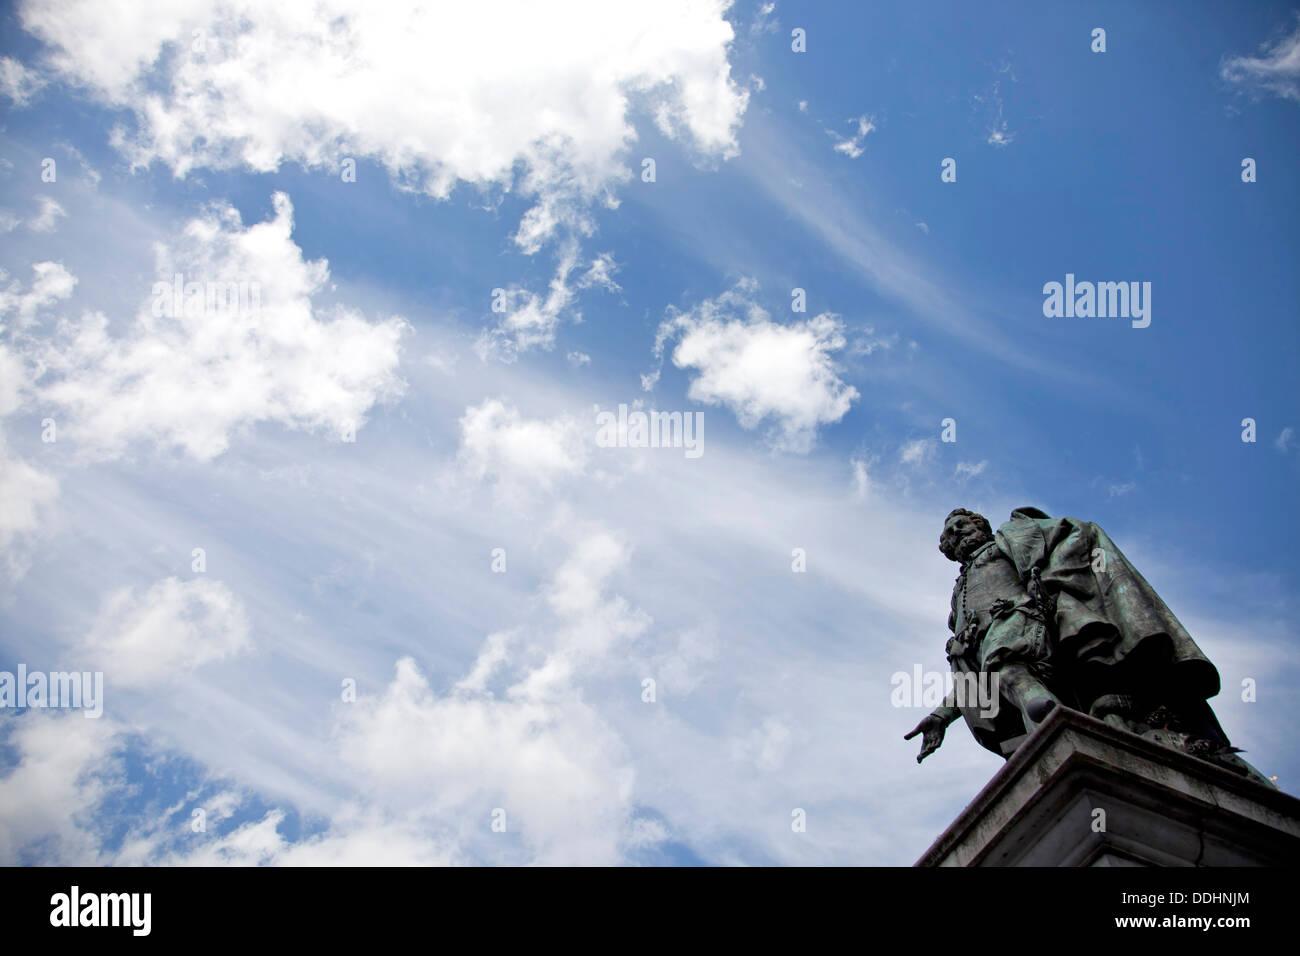 statue of Peter Paul Rubens on Groenplaats square in Antwerp, Belgium, Europe - Stock Image